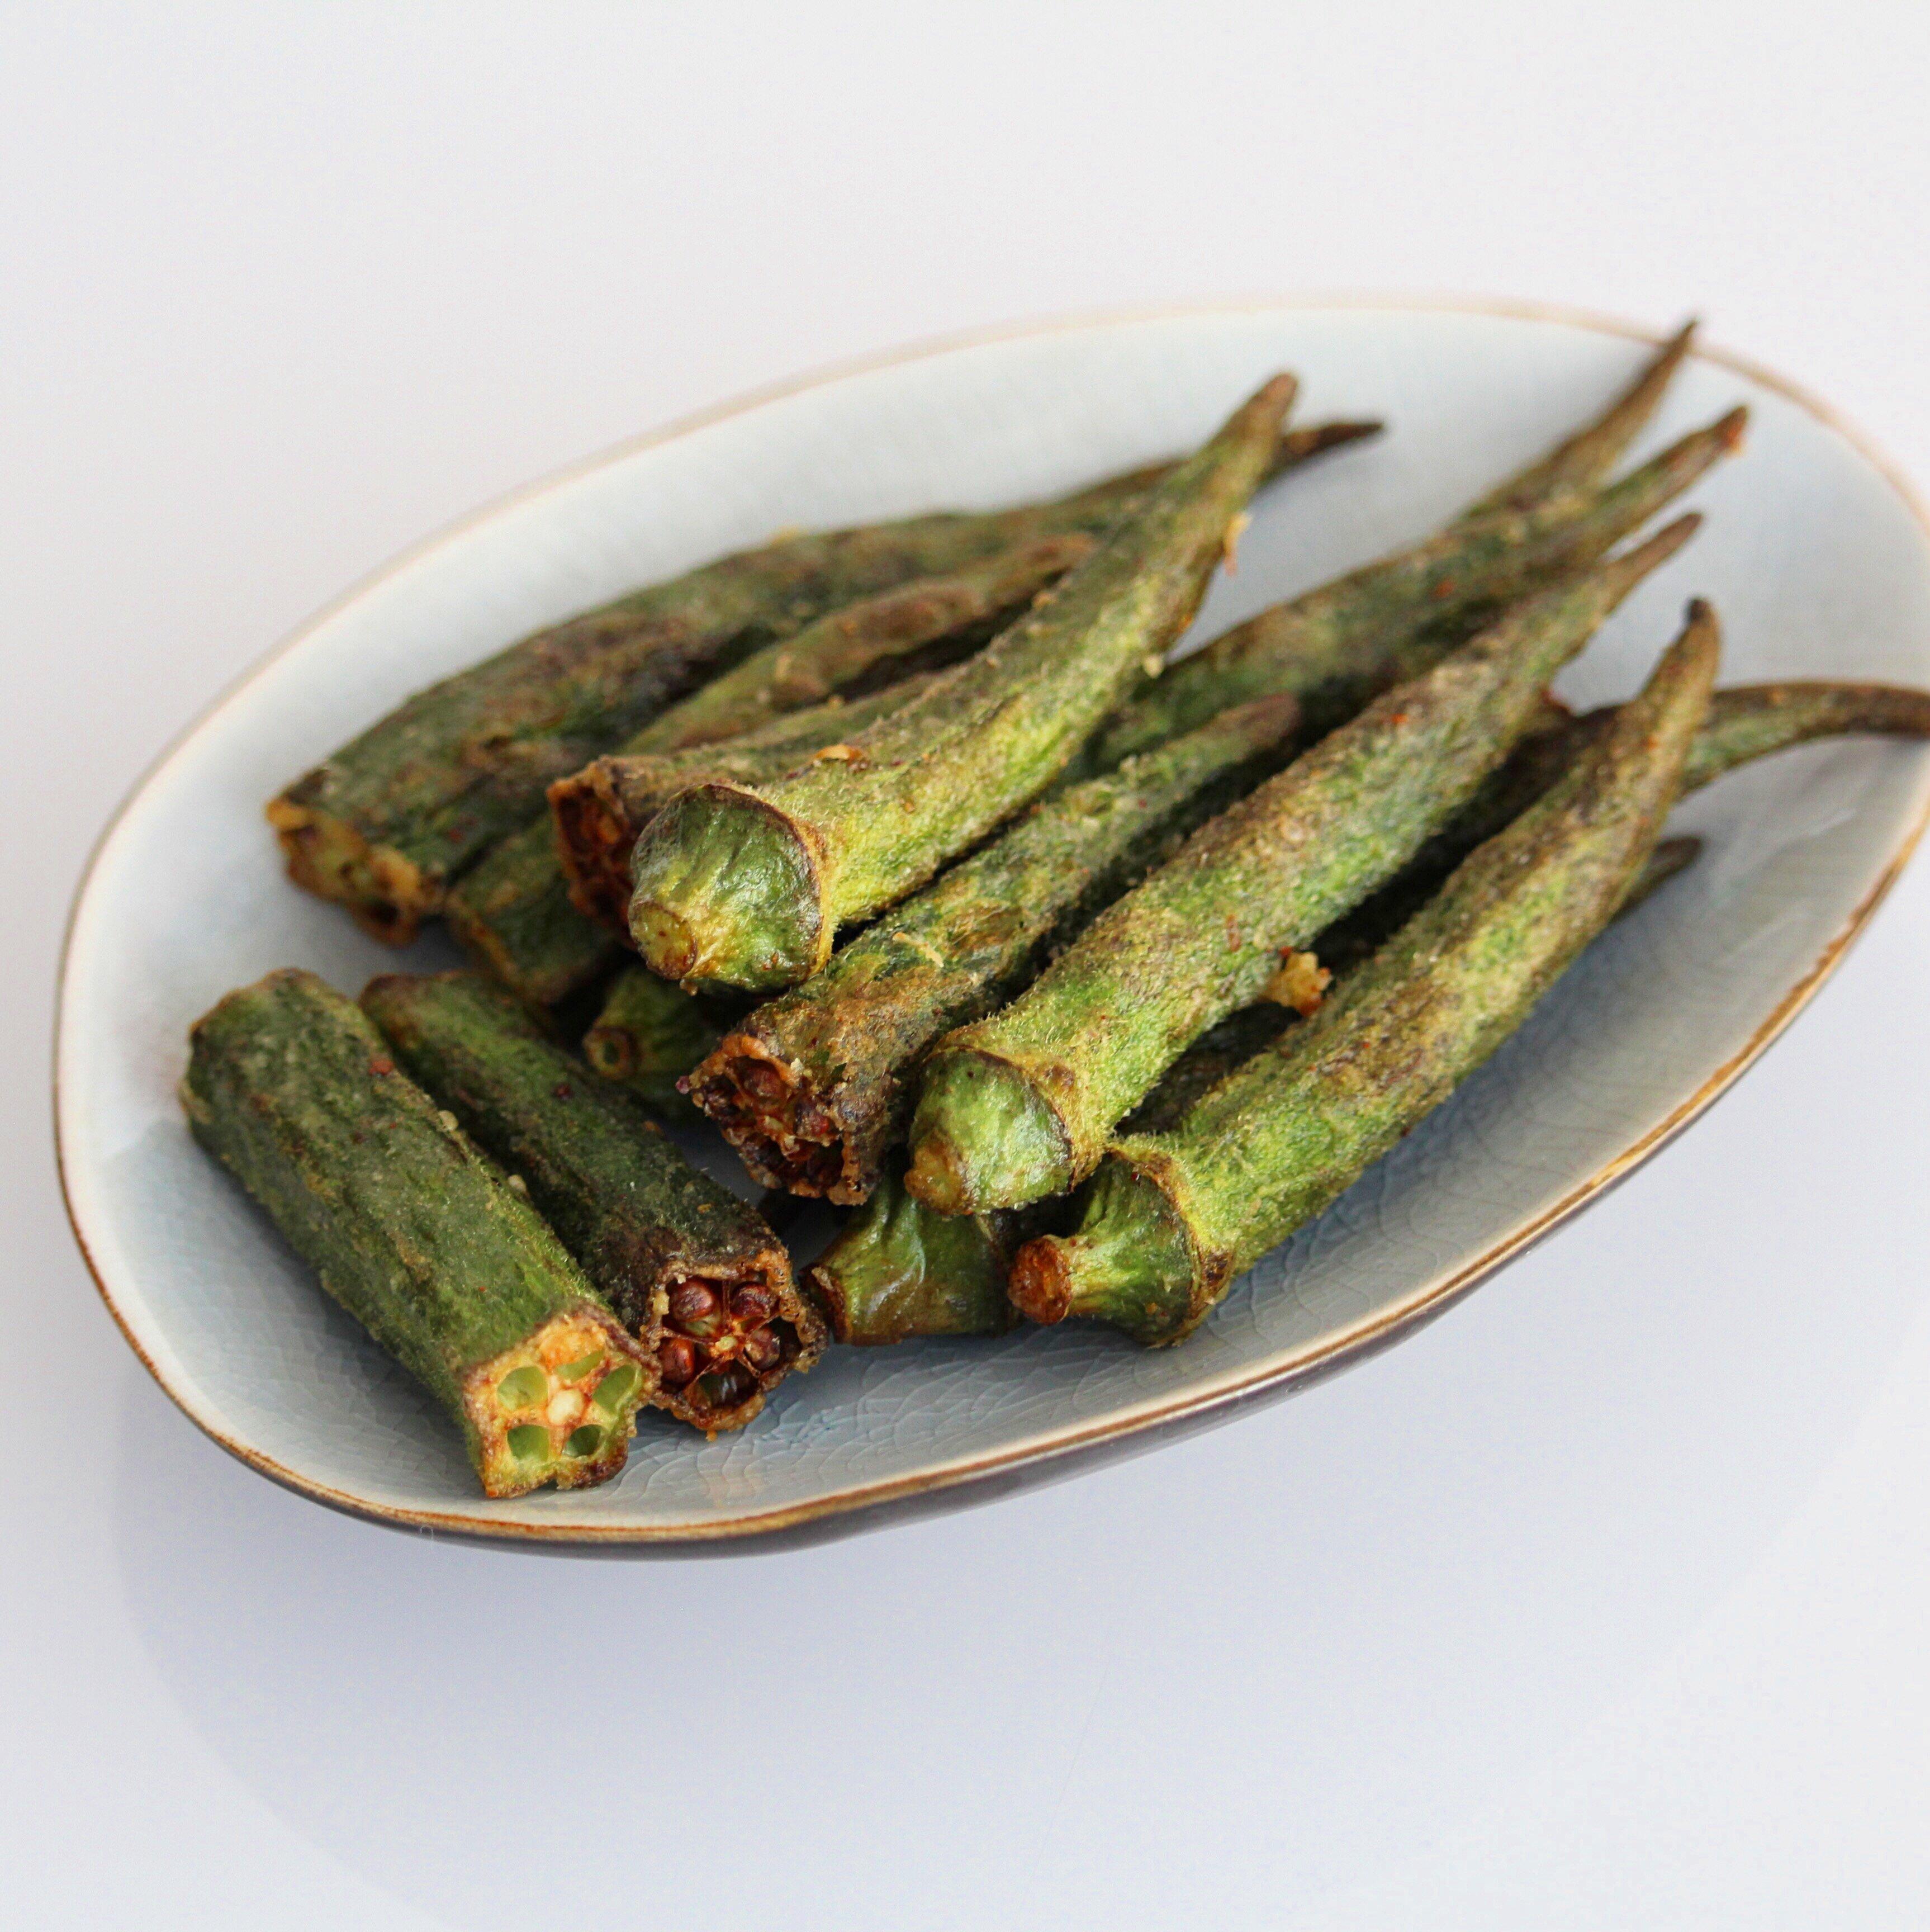 spicy air fried okra recipe